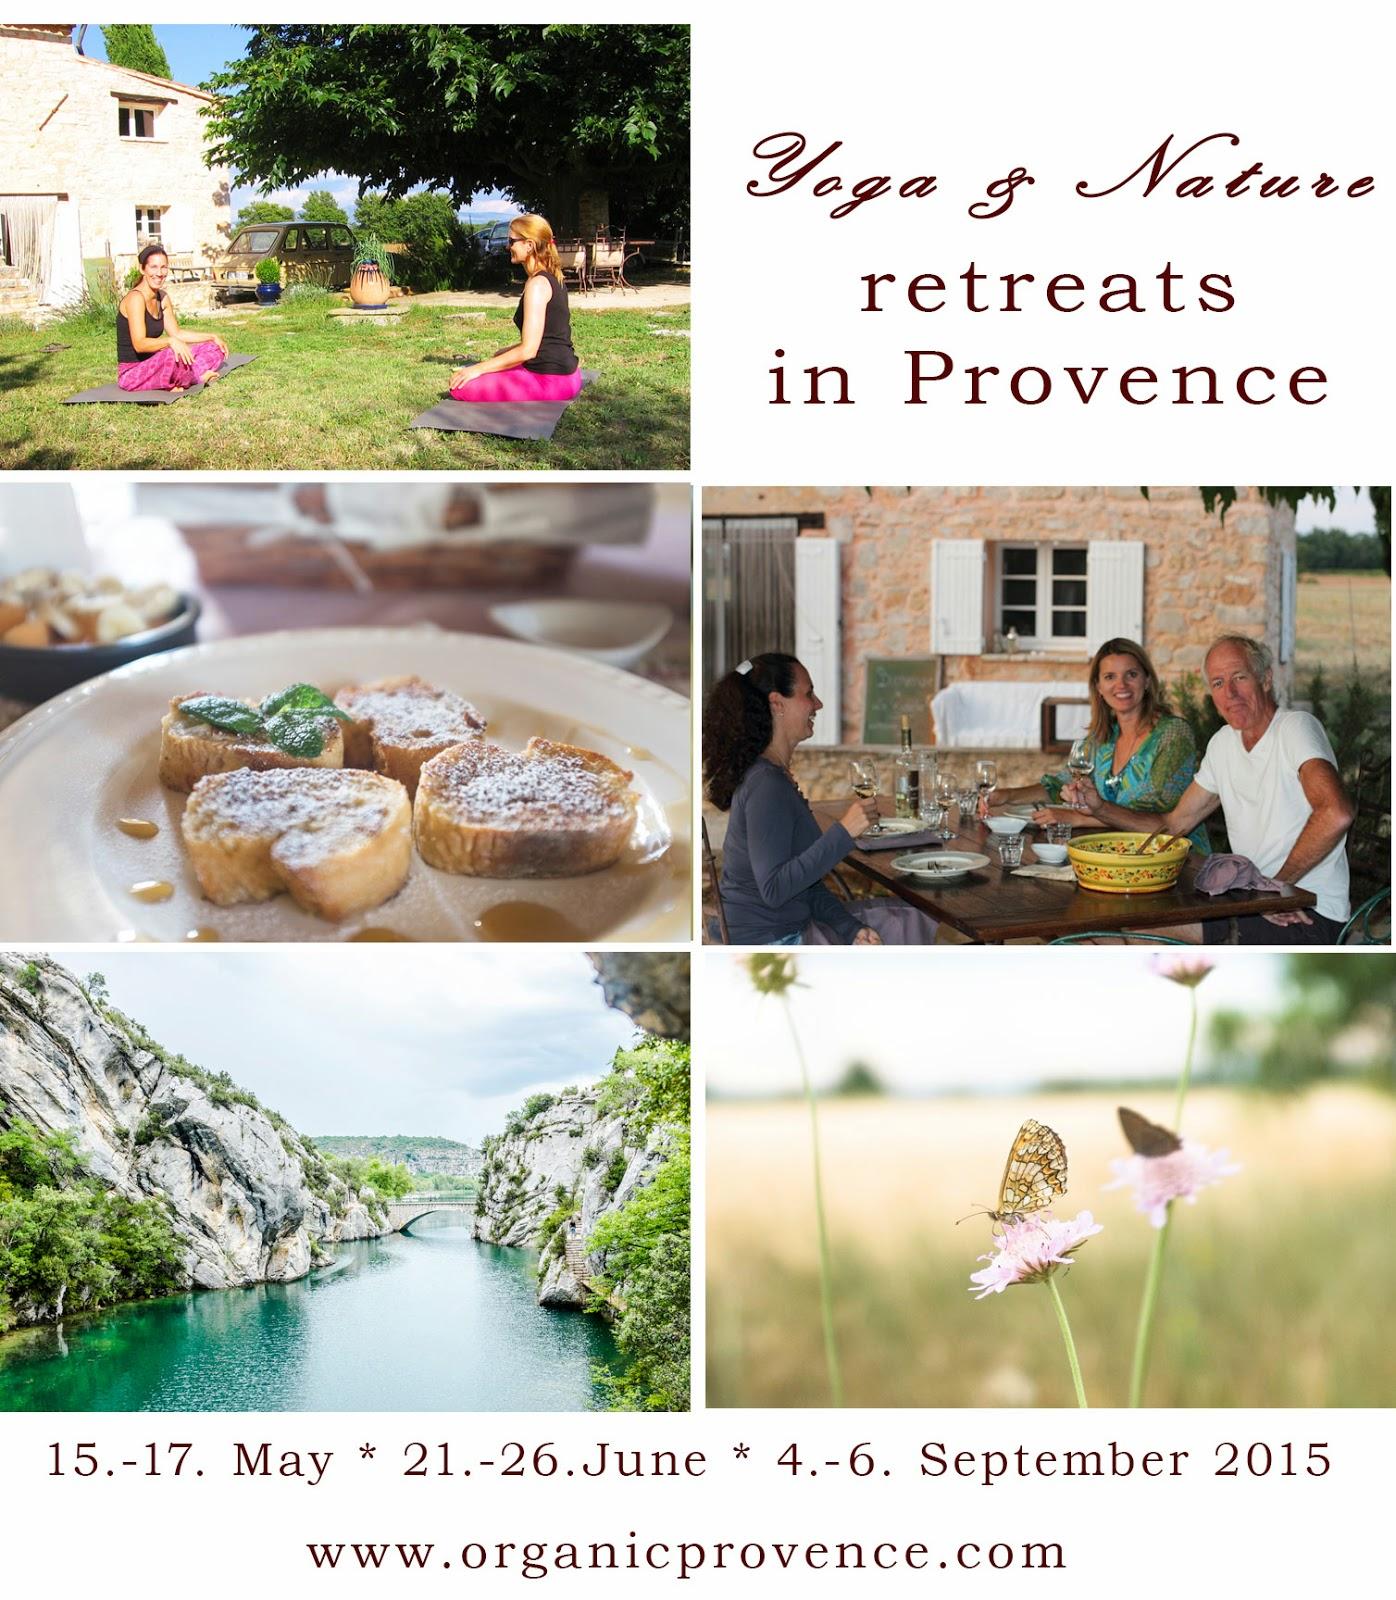 http://www.organicprovence.com/yoga_2015.html